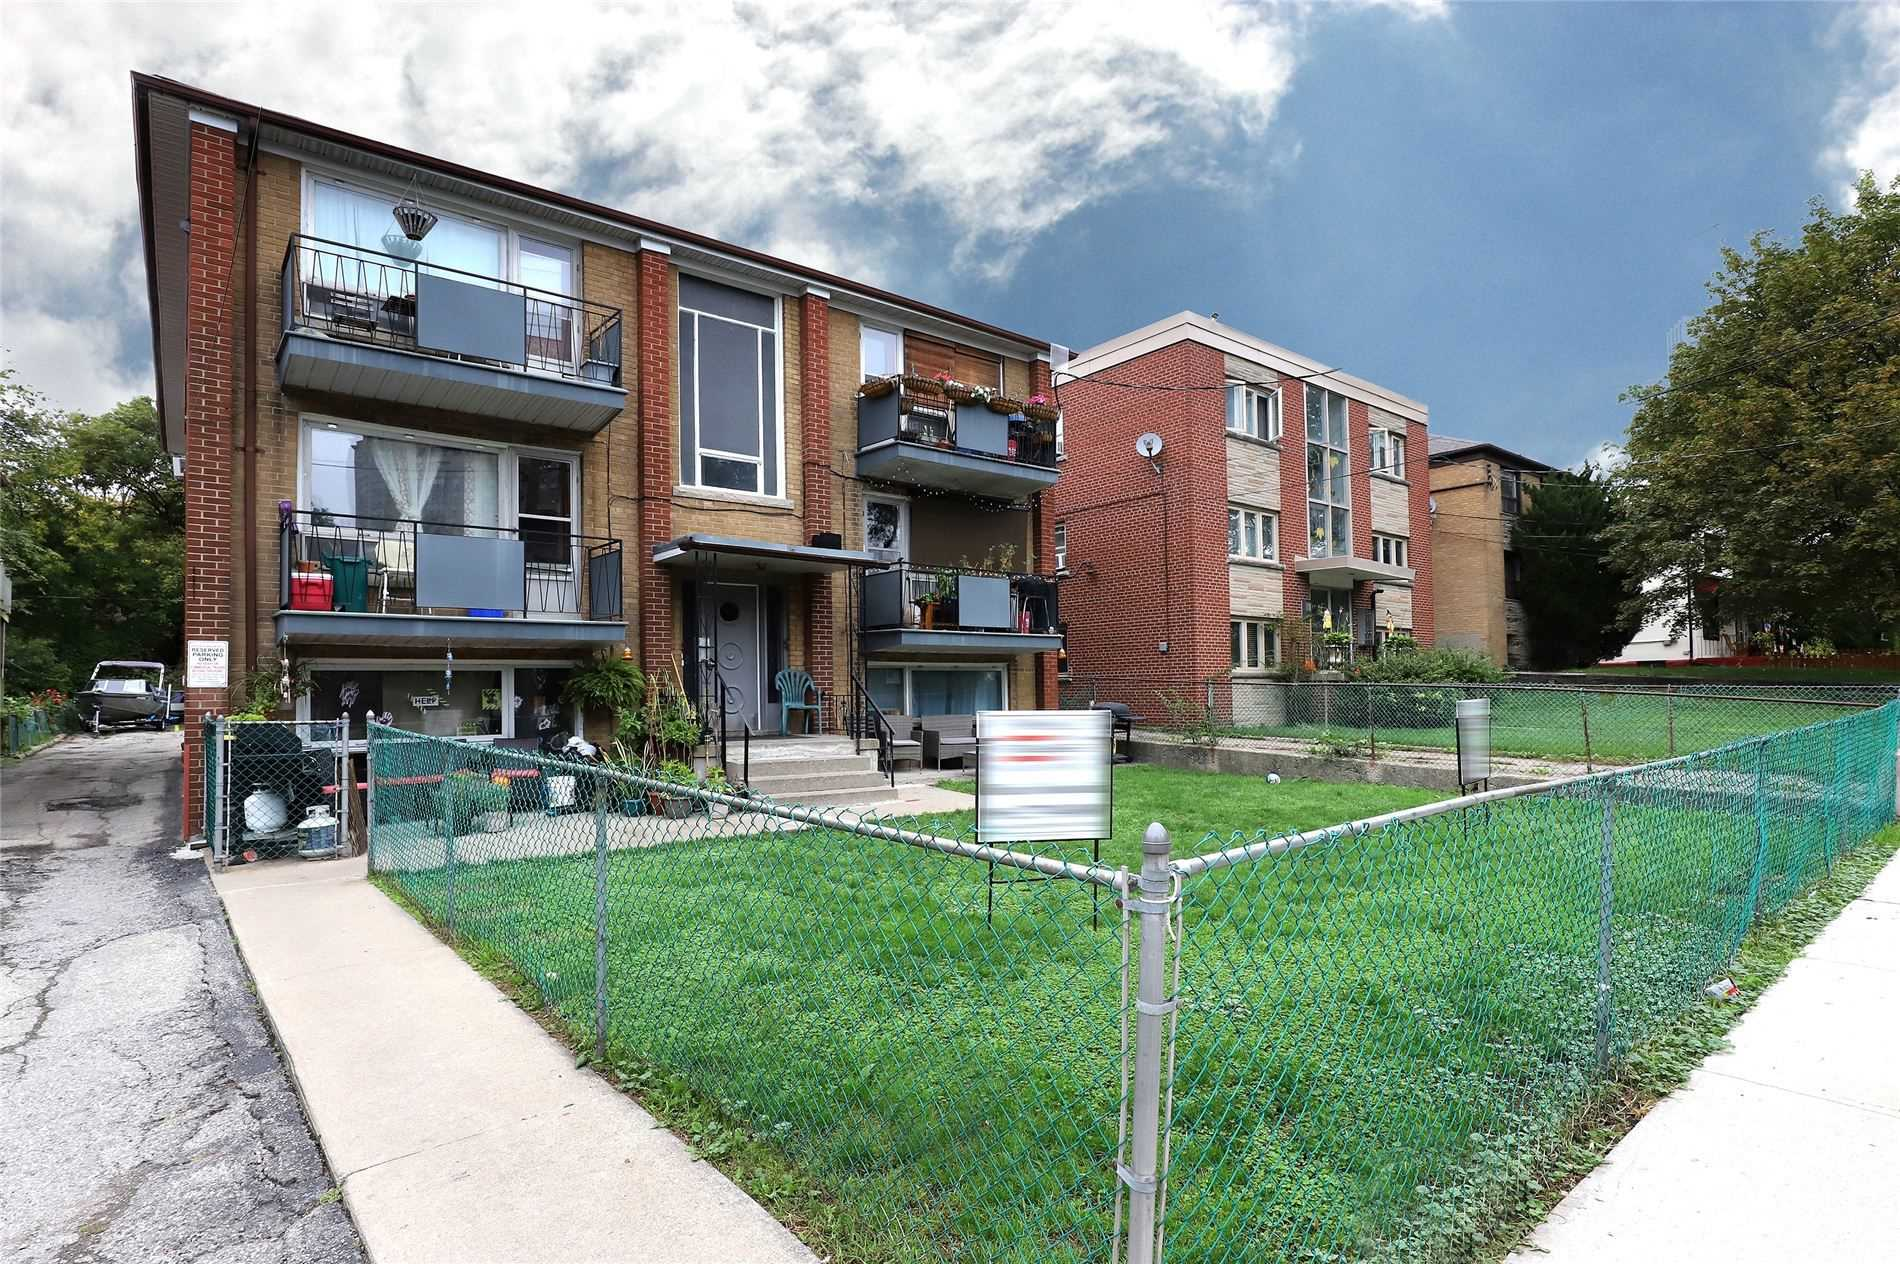 12 Victoria St, Toronto, Ontario M8V1M6, 6 Bedrooms Bedrooms, 20 Rooms Rooms,6 BathroomsBathrooms,Multiplex,For Sale,Victoria,W5399889